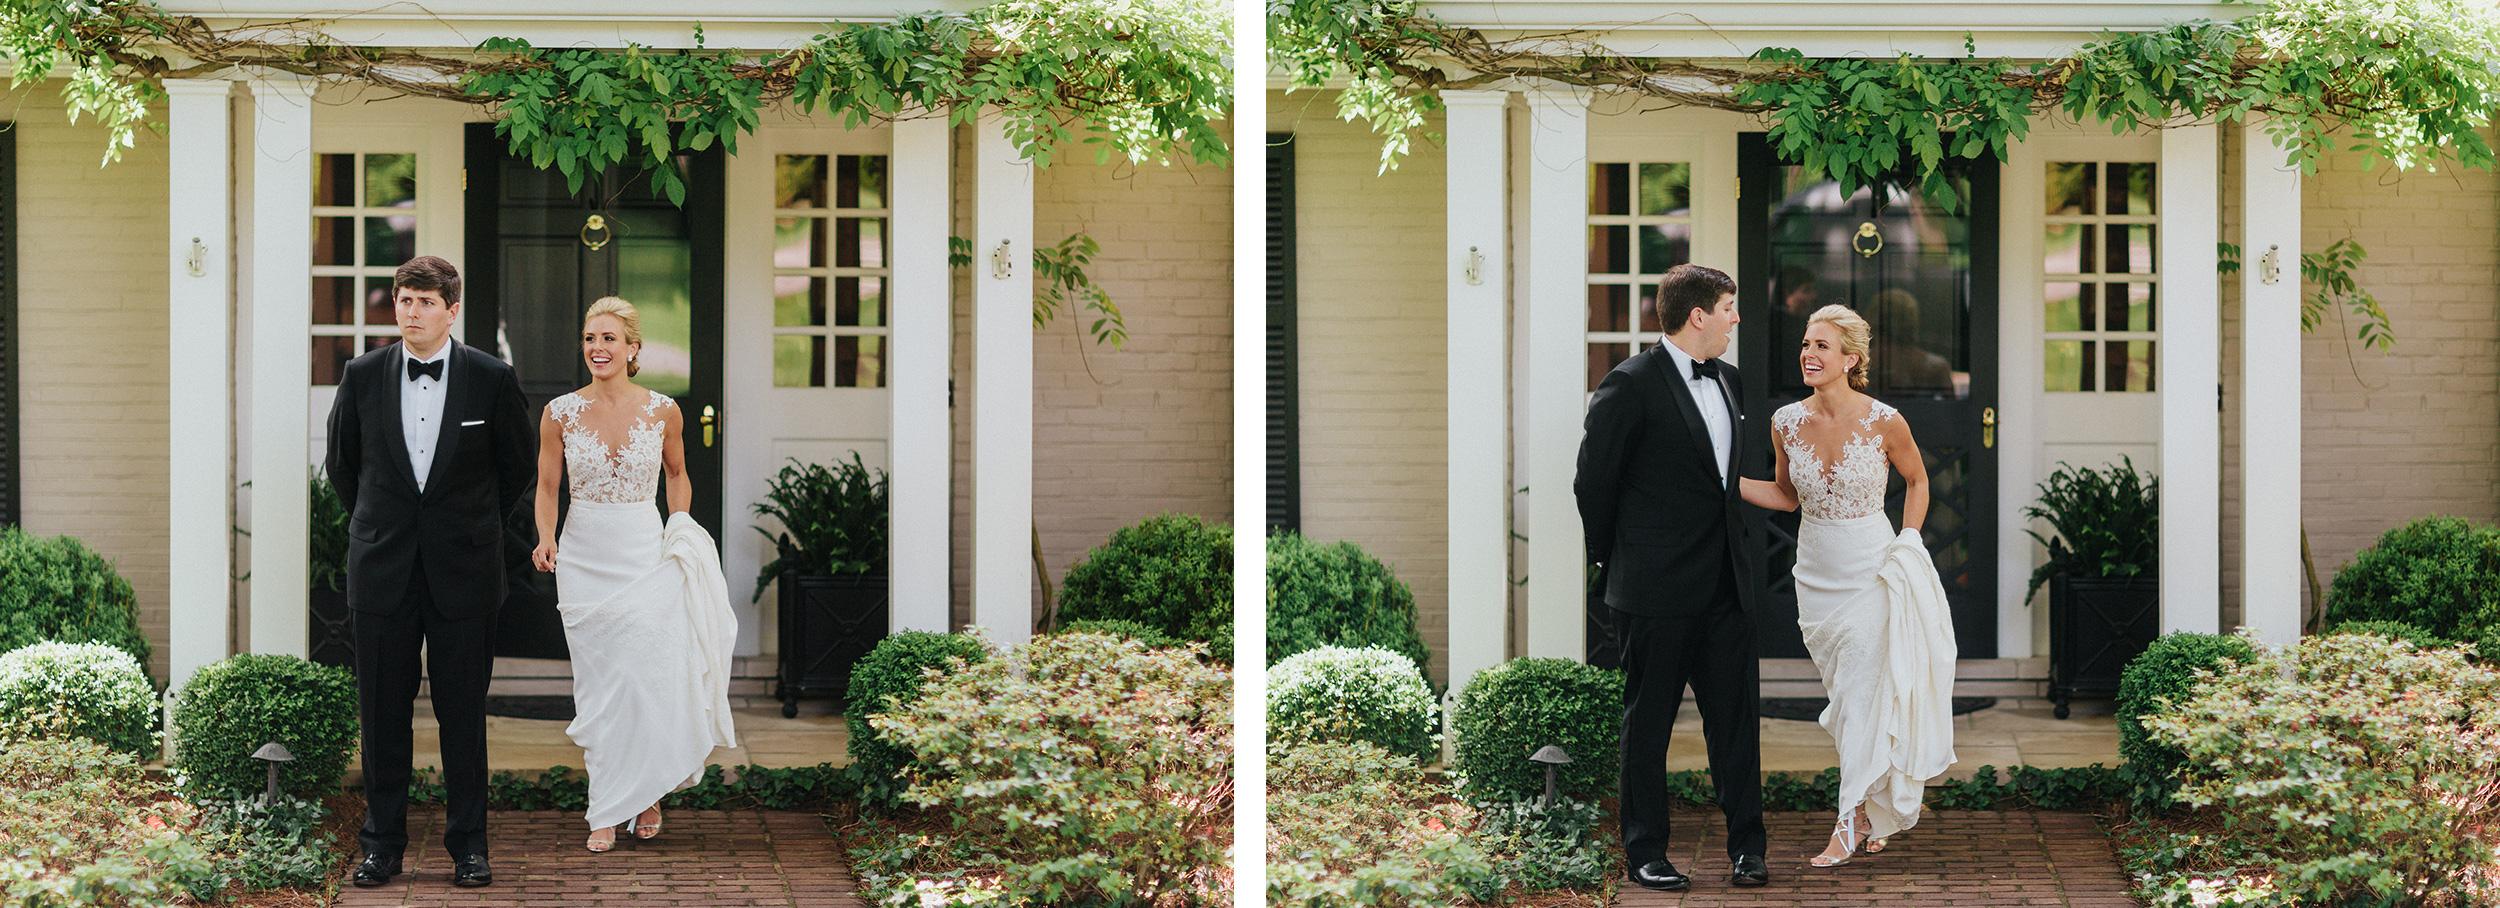 speed-art-museum-wedding-photographer-12.JPG